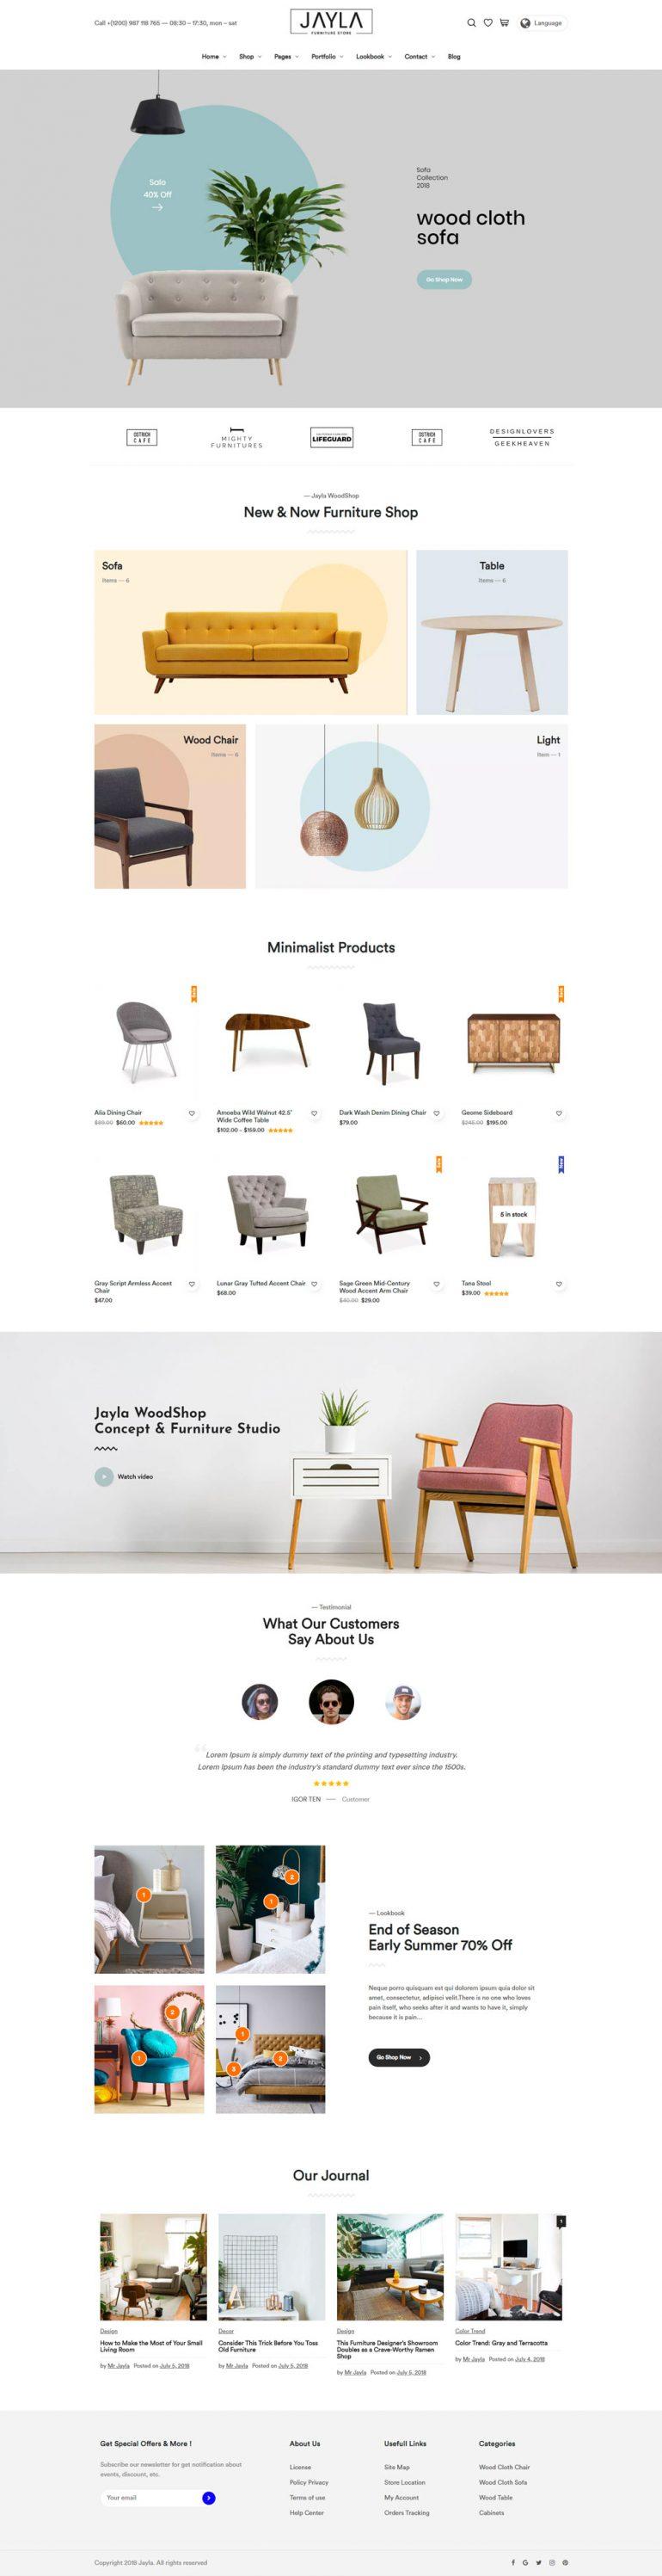 Jayla Furniture